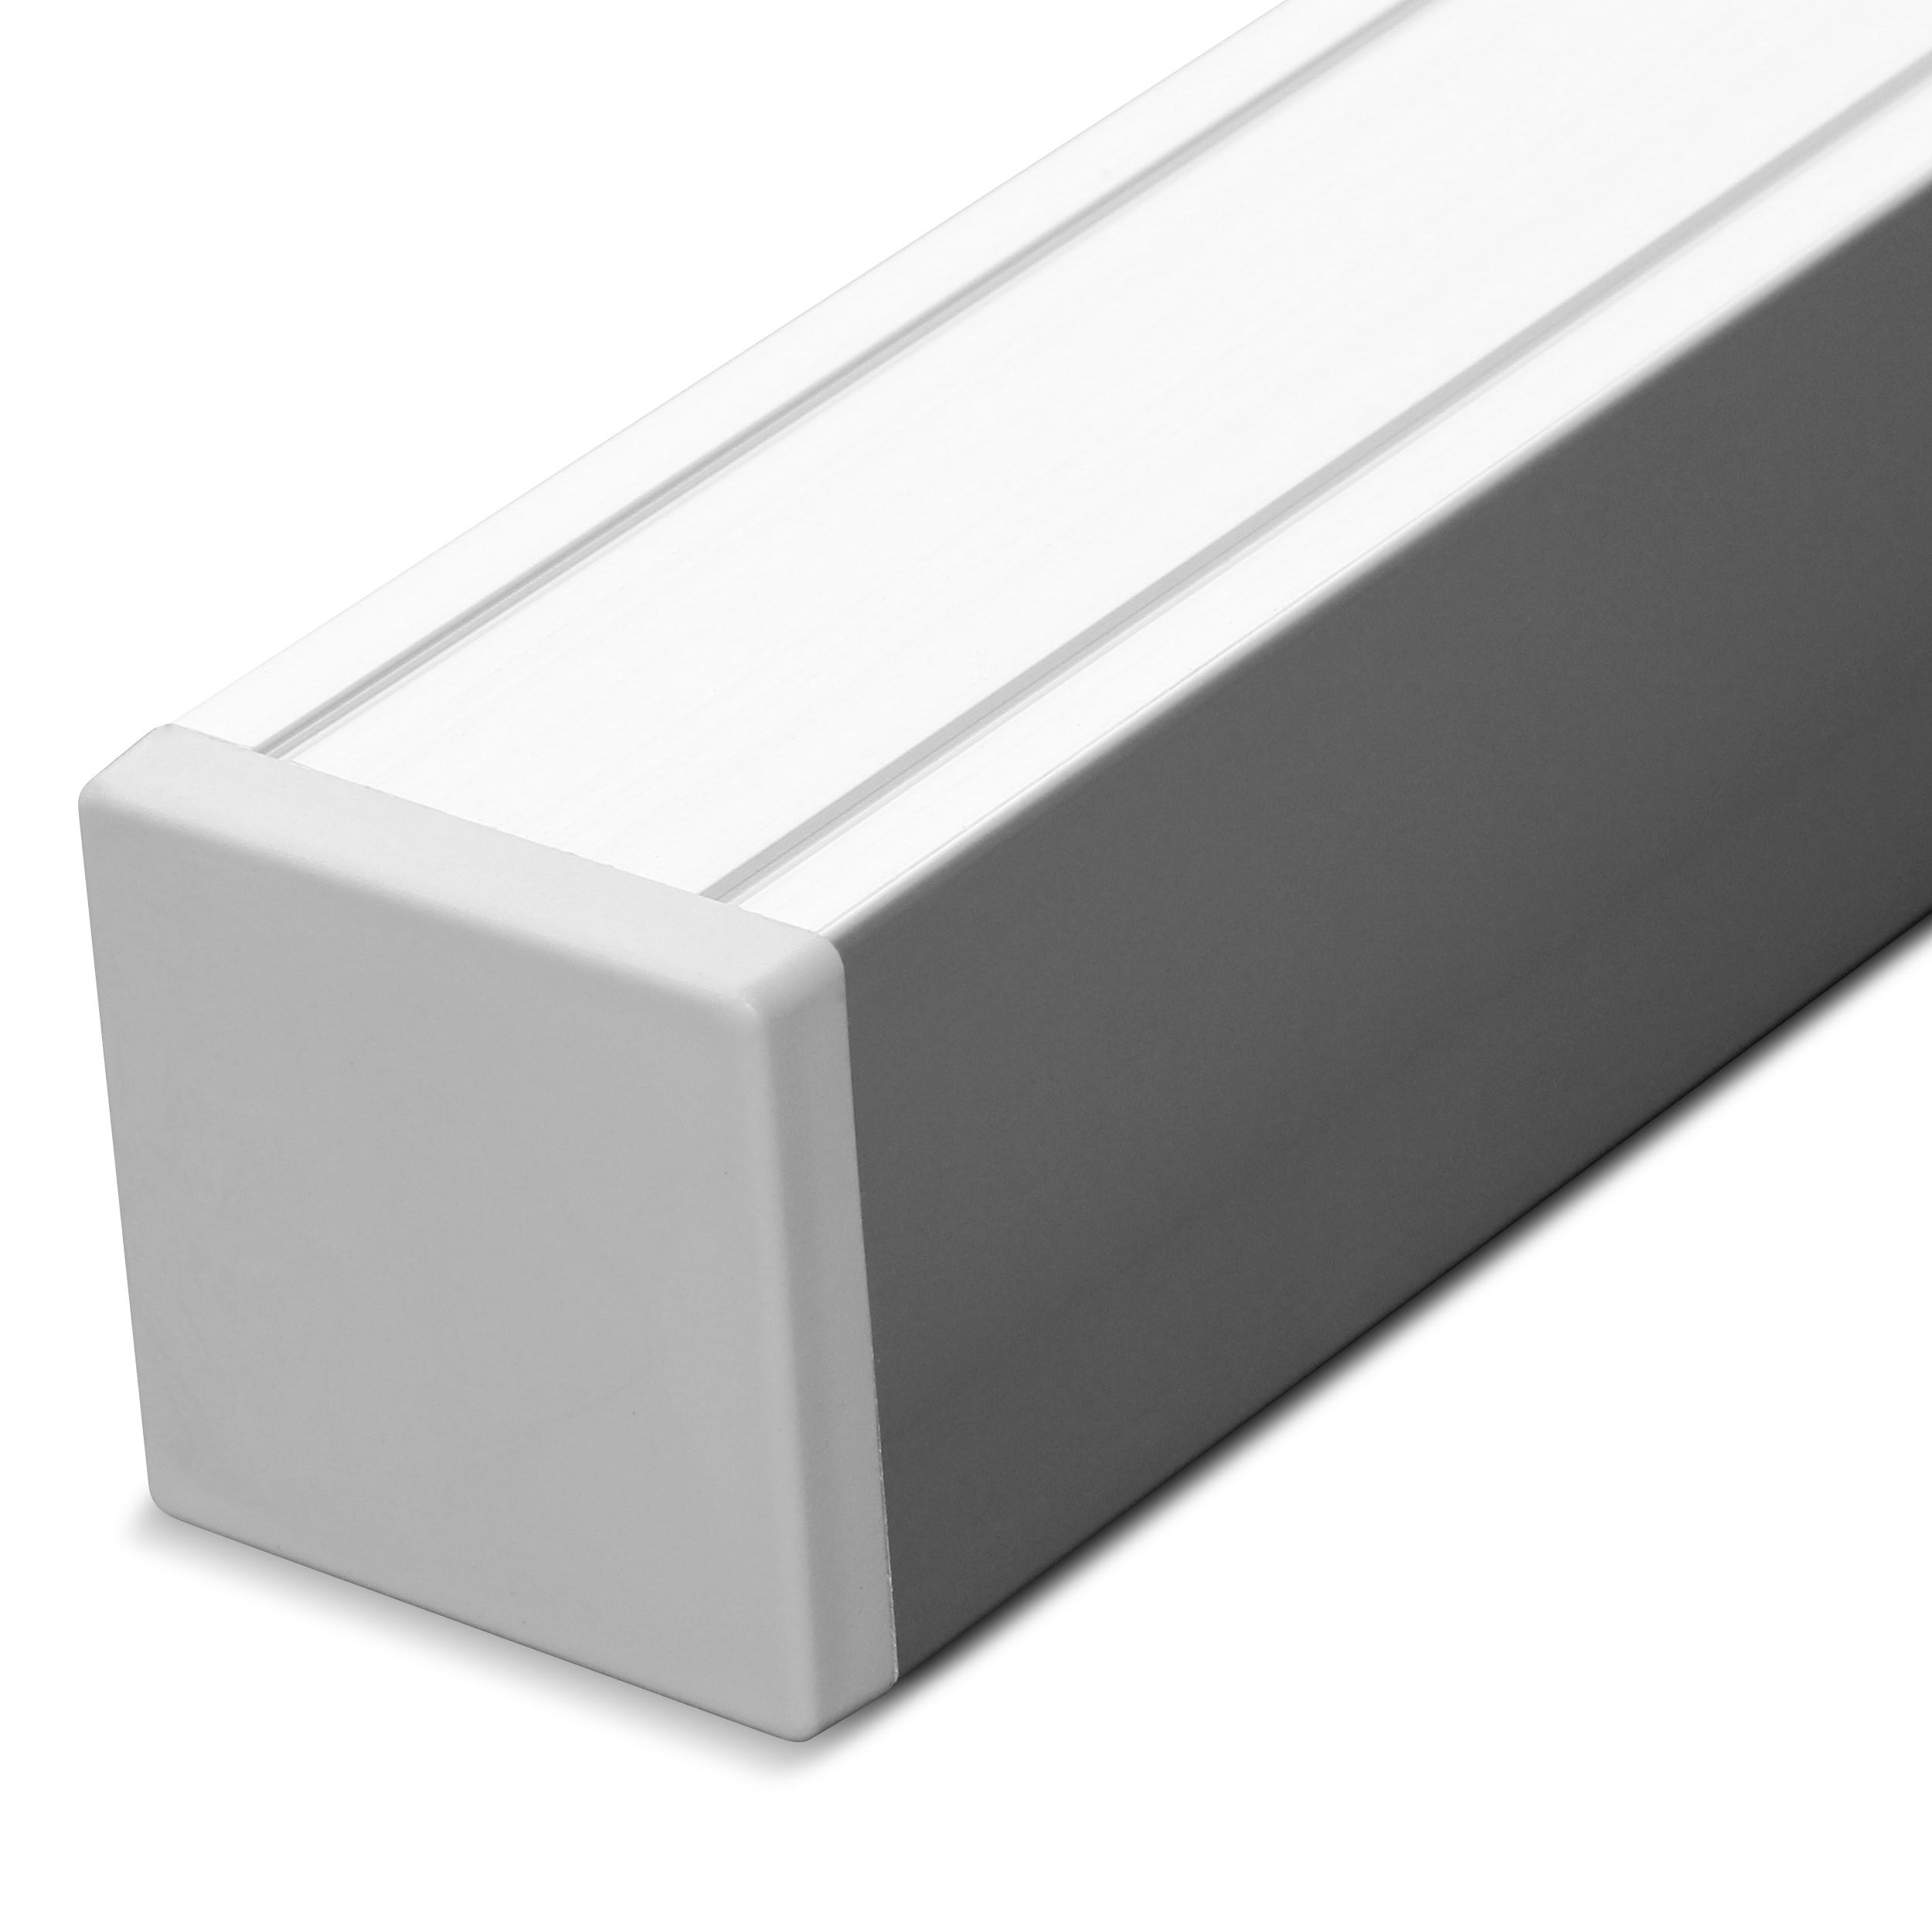 Exclusive / Silver Line Aluminium-Pfosten Silber 185 x 6,8 x 6,8 cm